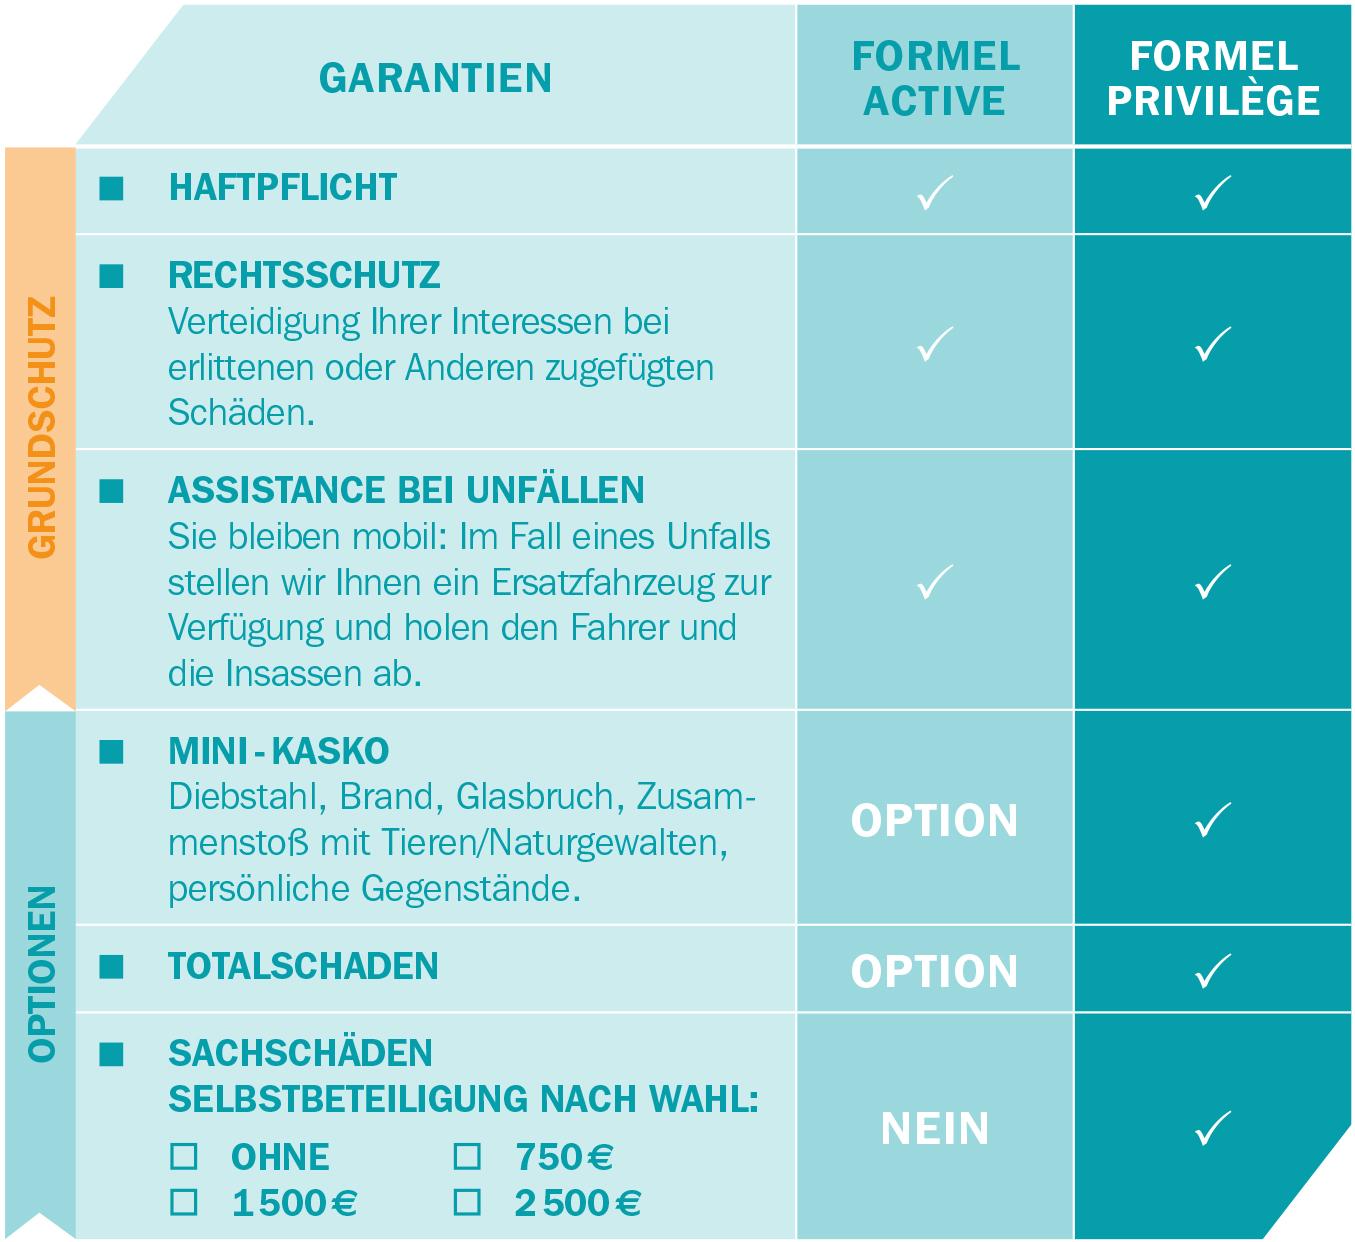 AXA Luxembourg - Tableau formules optidrive DE